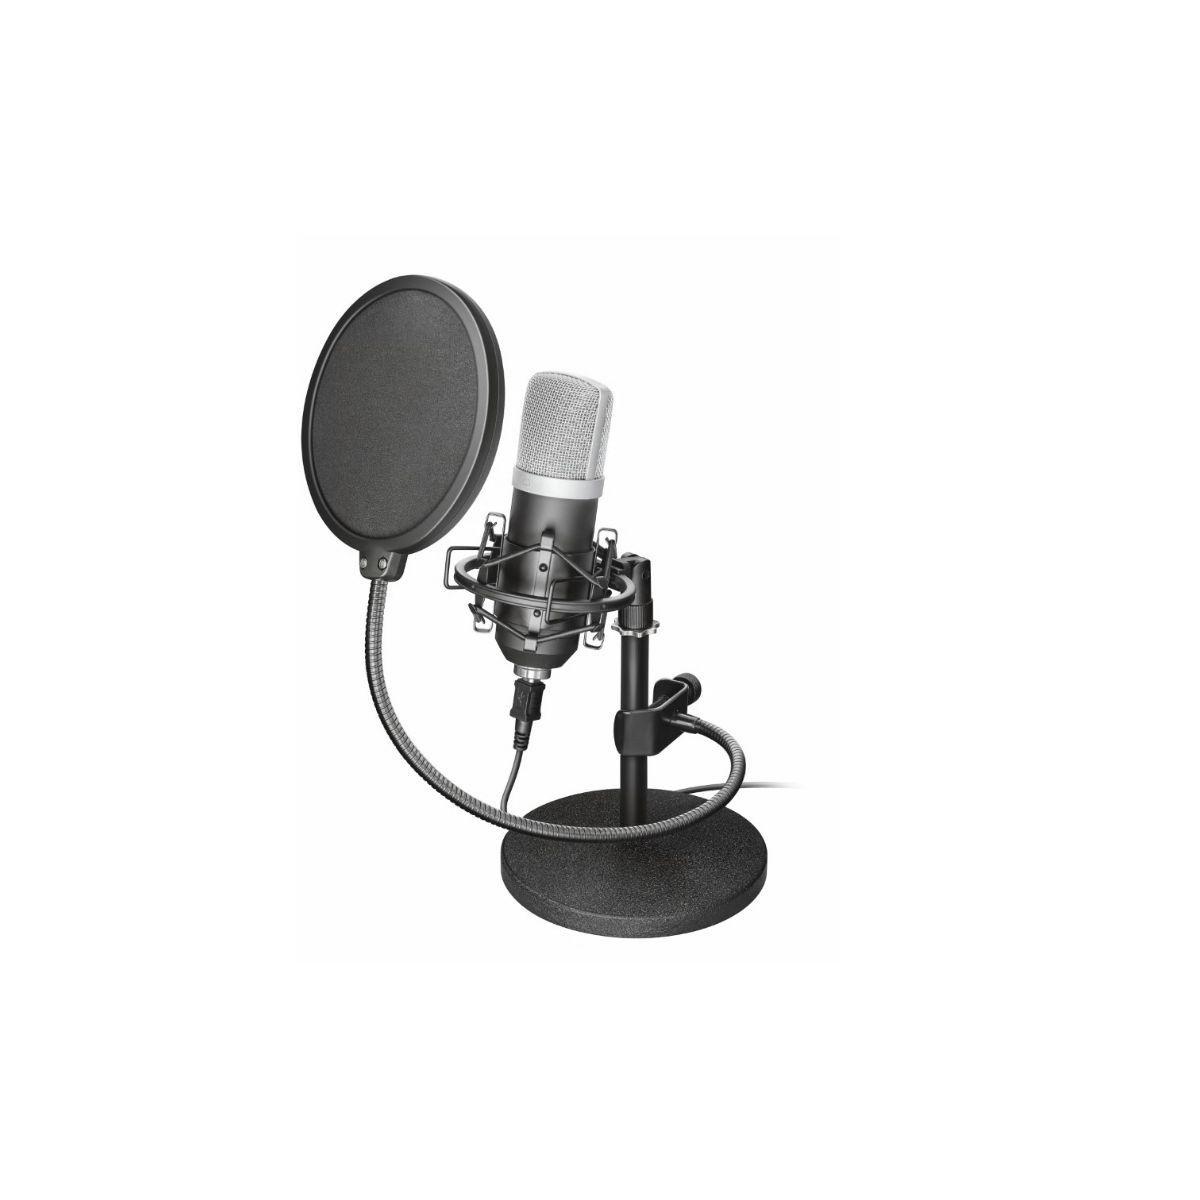 Micro trust emita microphone de studio usb - 15% de remise imm�diate avec le code : school15 (photo)